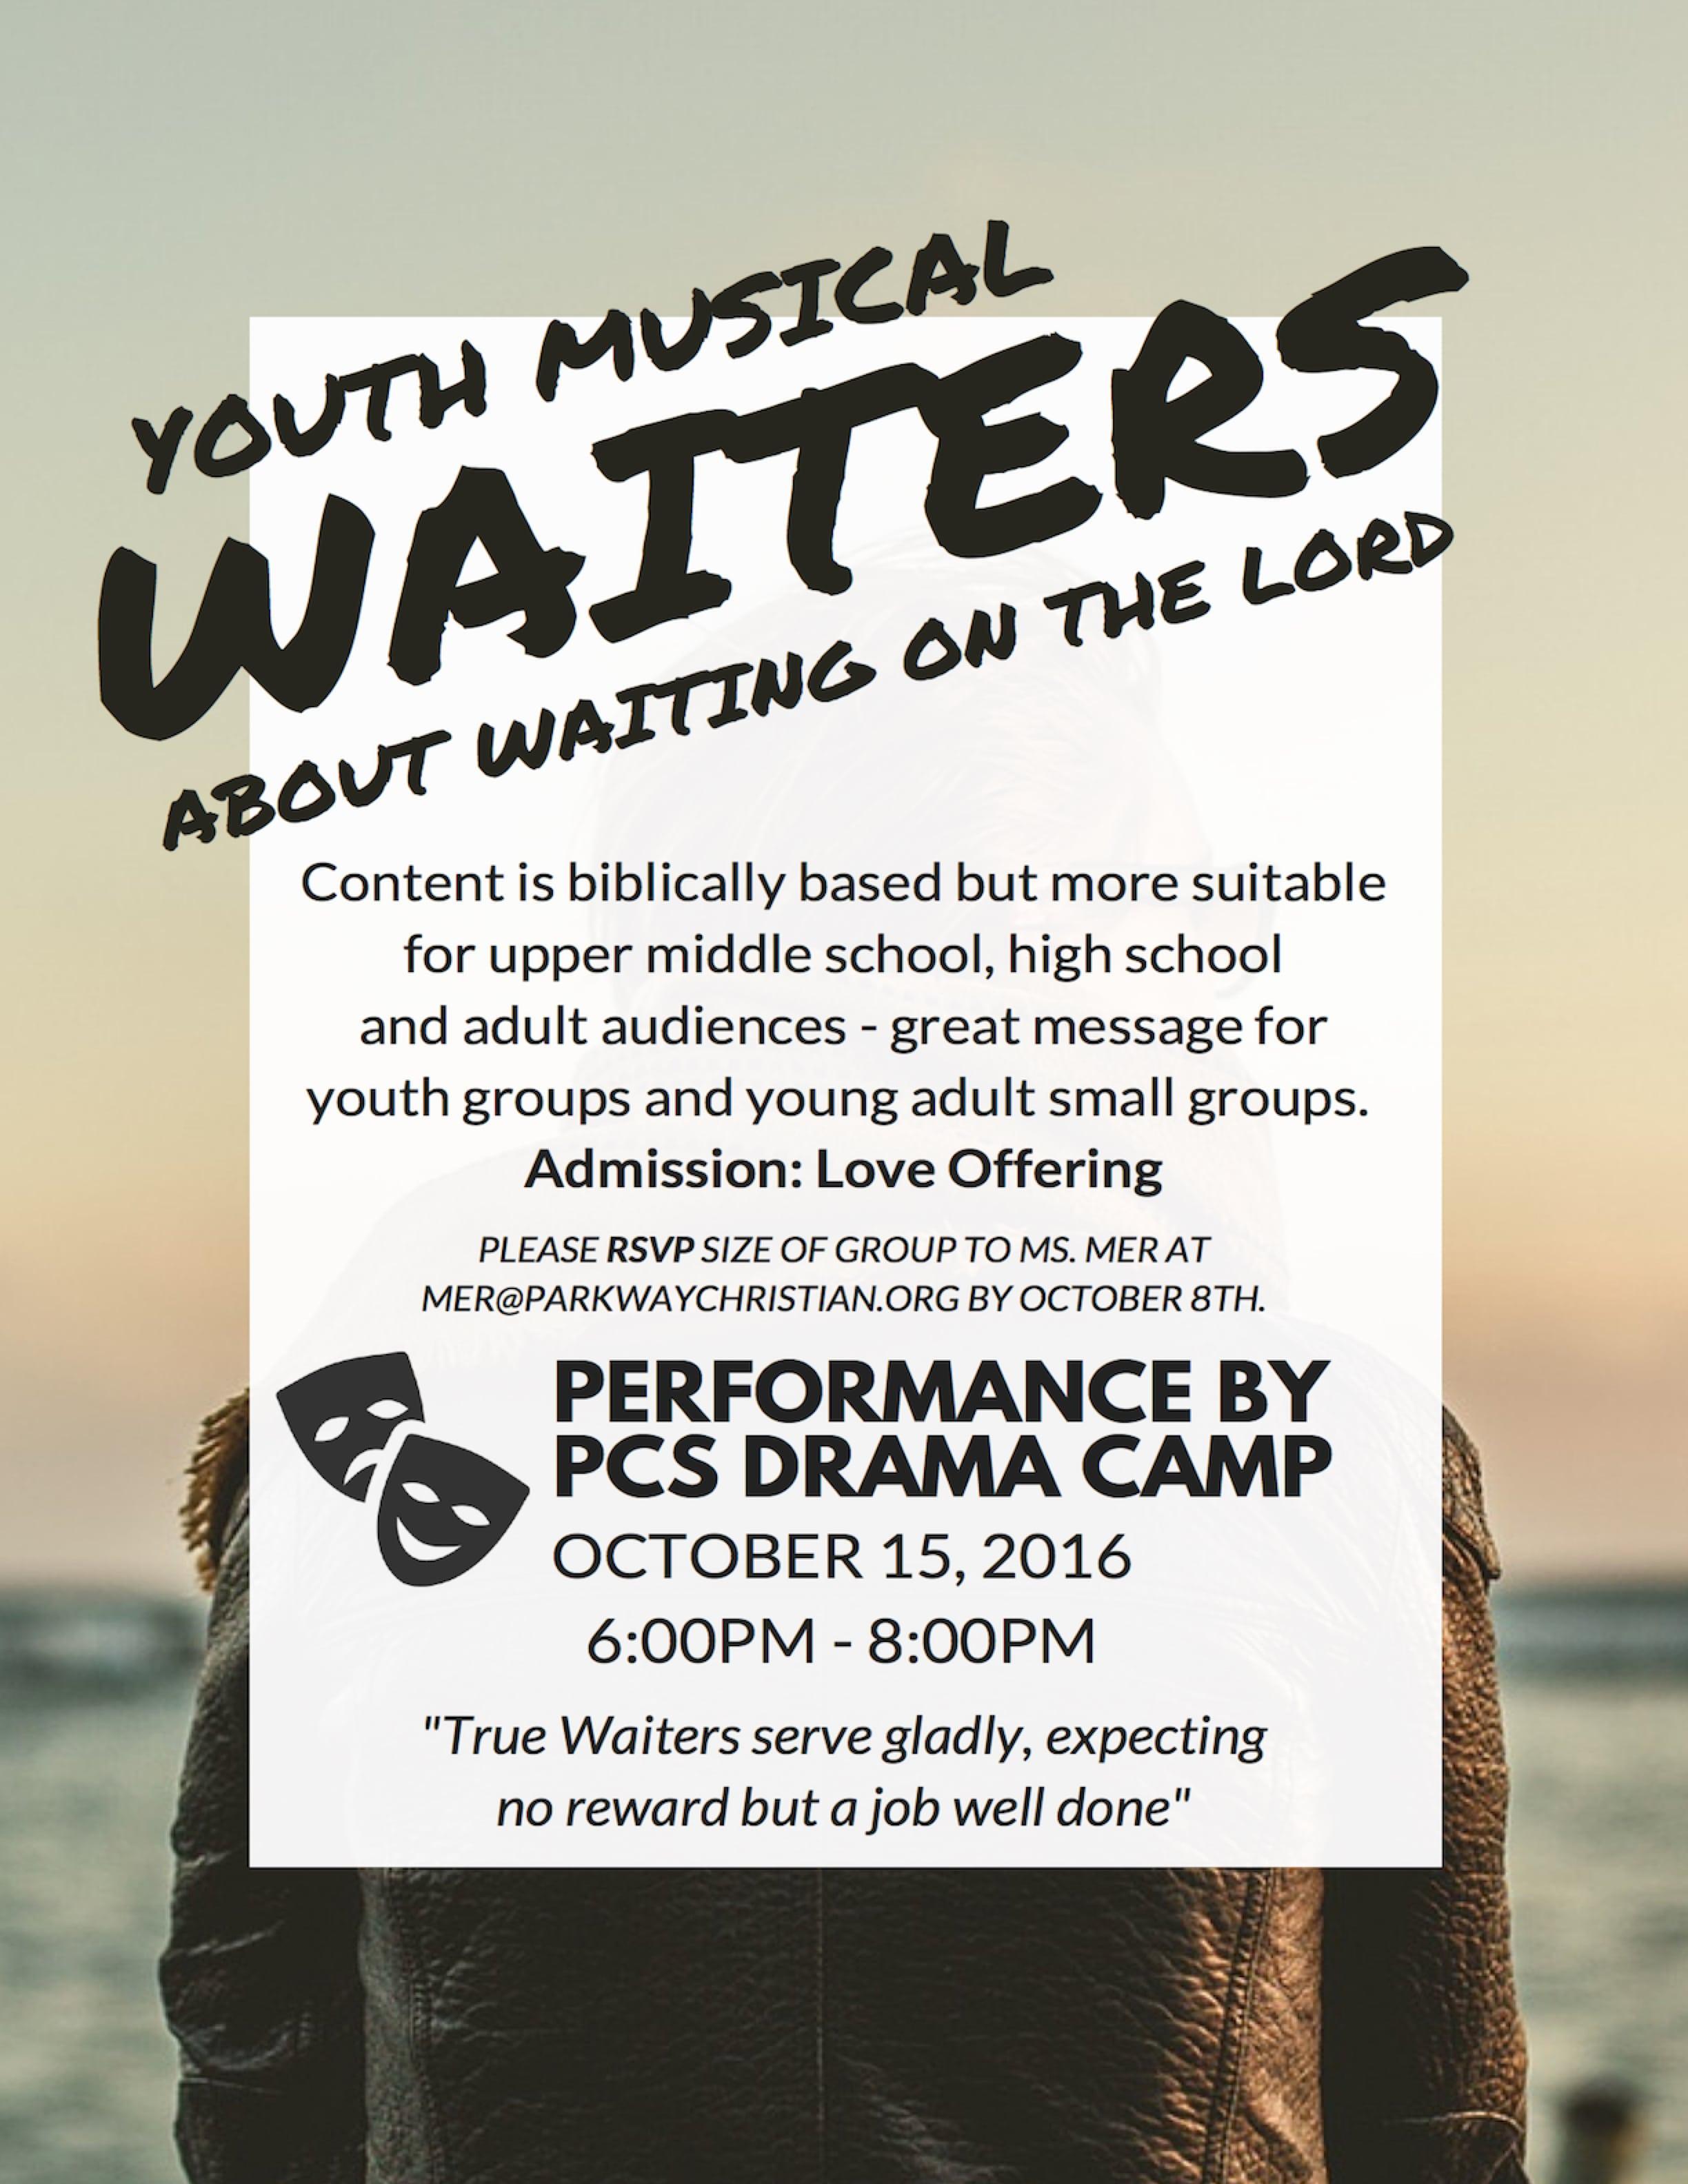 Parkway Christian School Summer Drama Camp Performance - Waiters